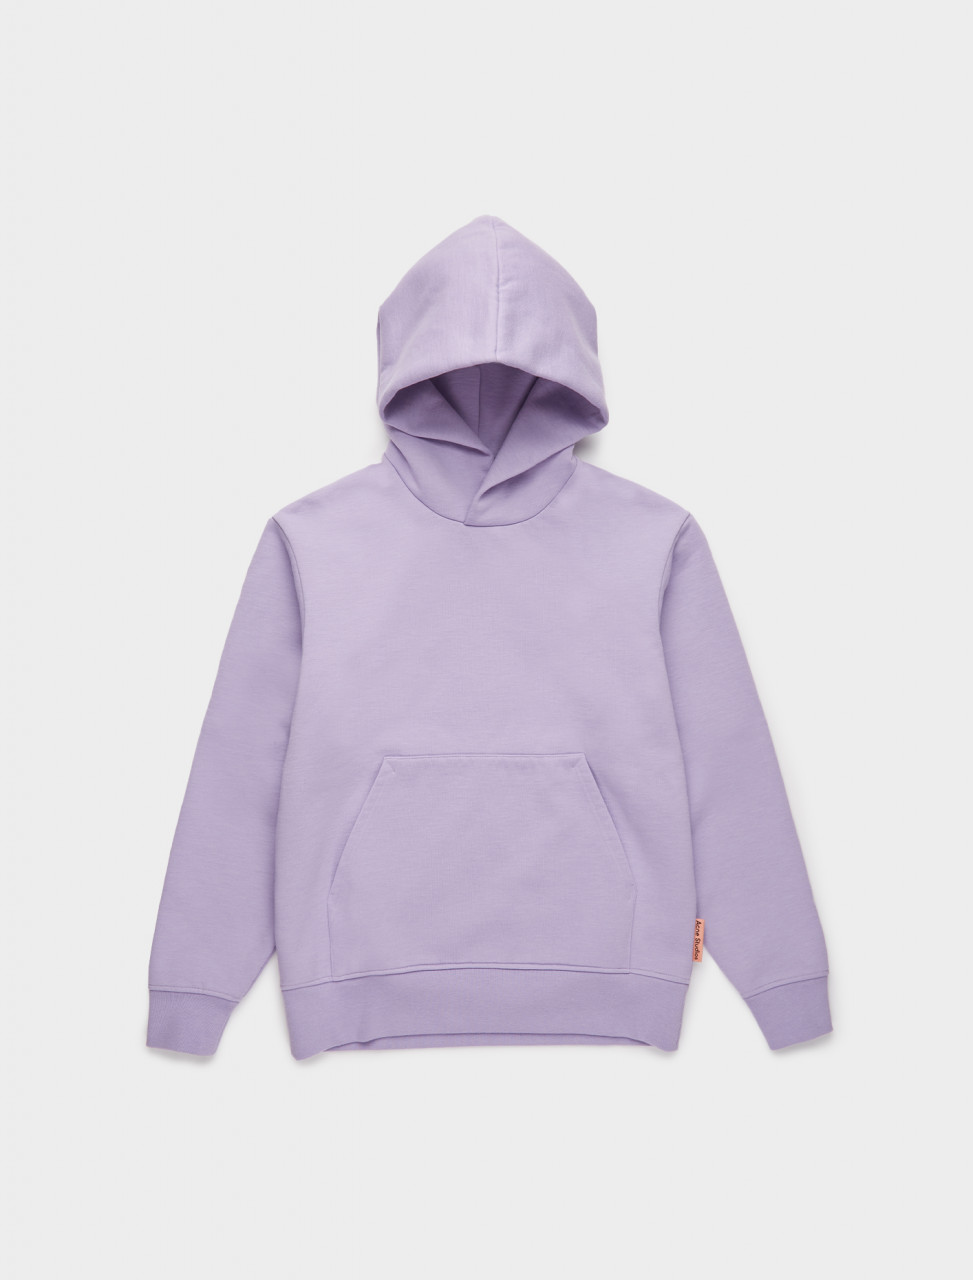 110-BI0080-ADK ACNE STUDIOS Classic Fit Hooded Sweatshirt in Light Purple